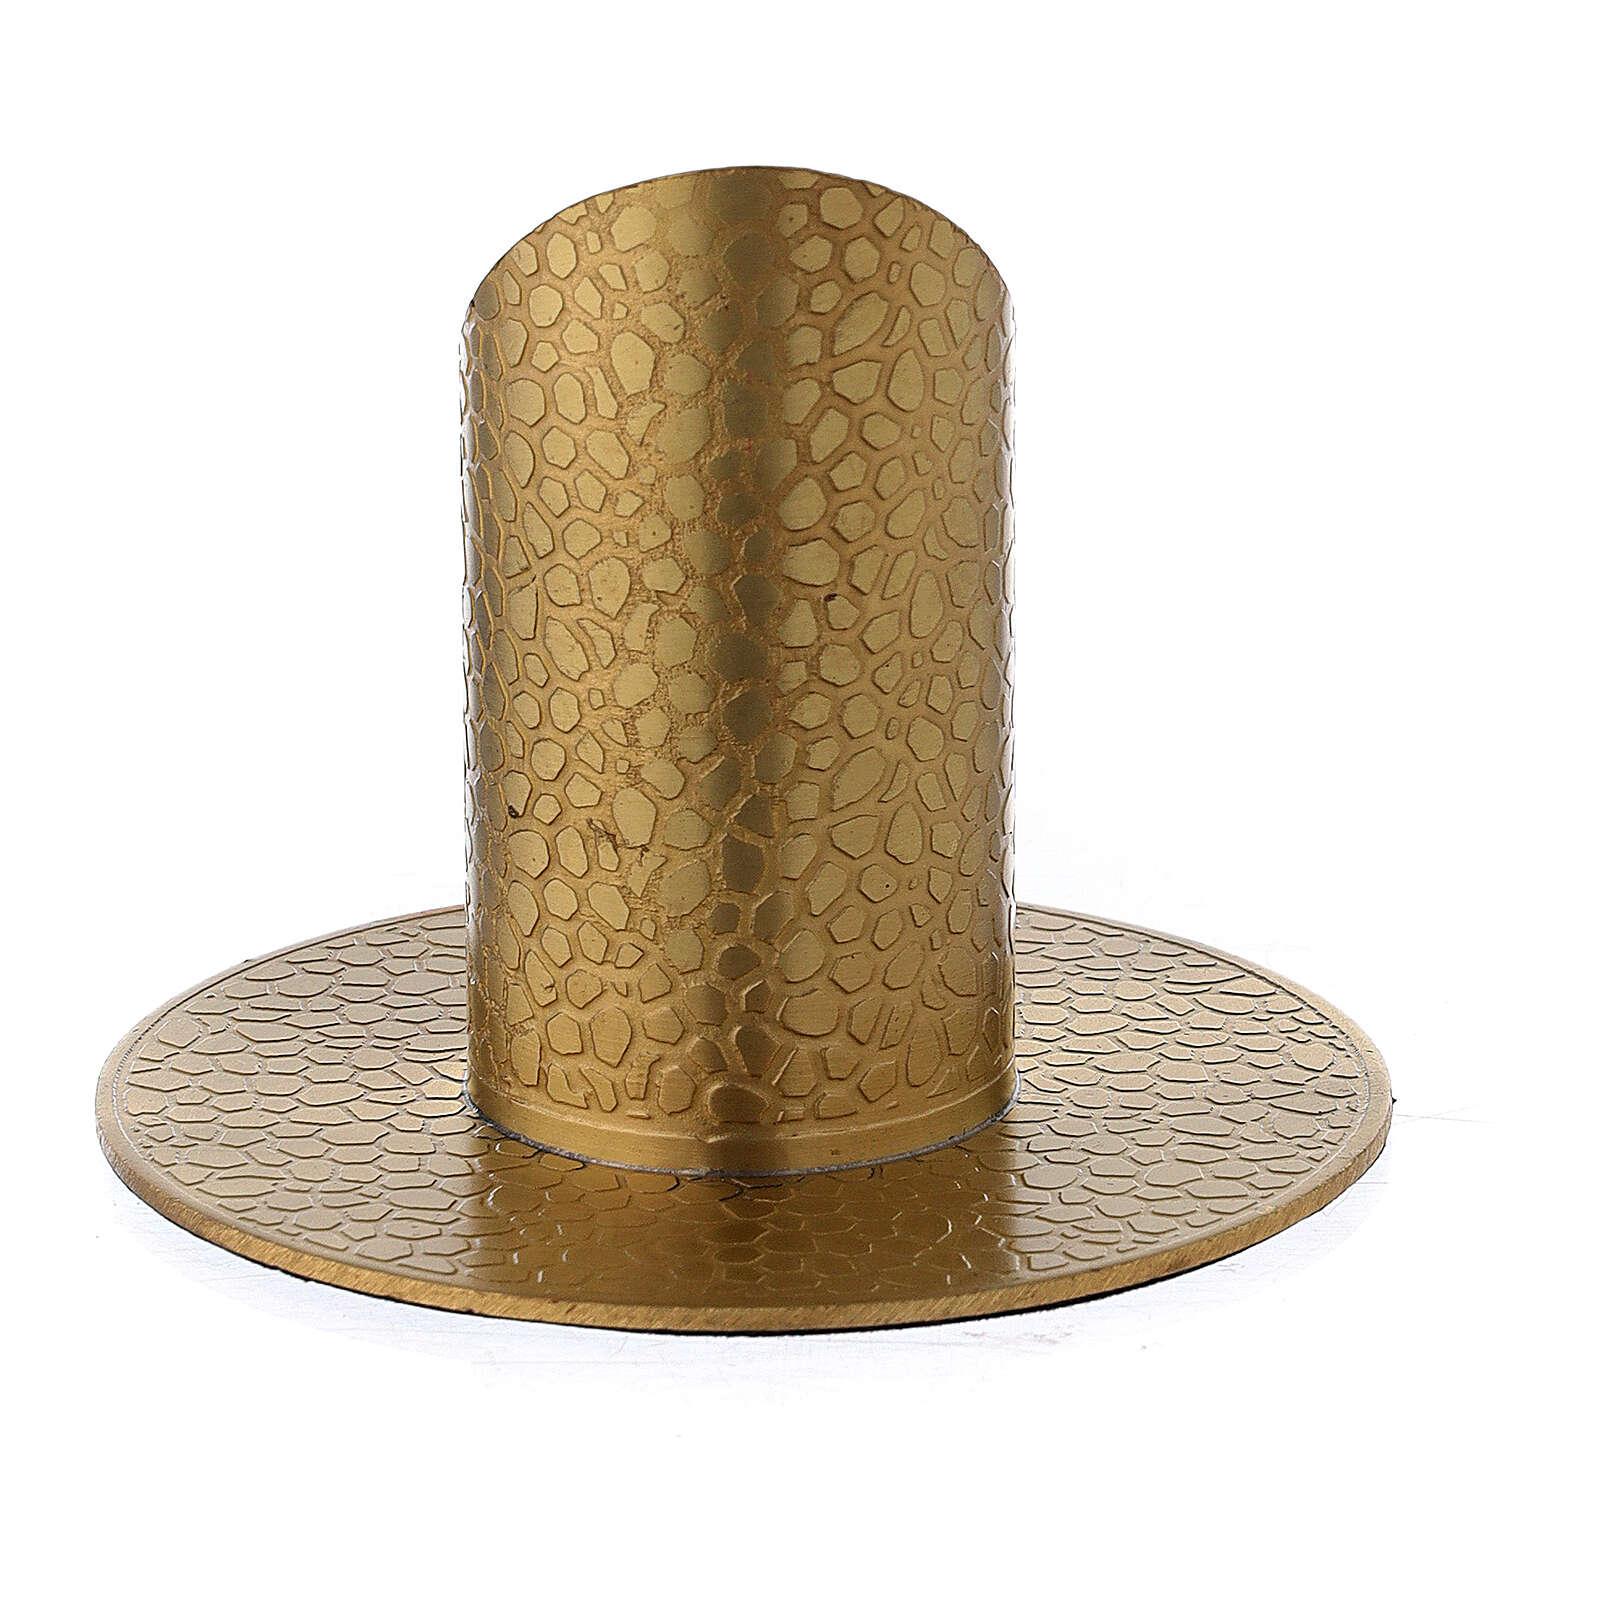 Portacandela ottone dorato effetto pelle 3 cm 4